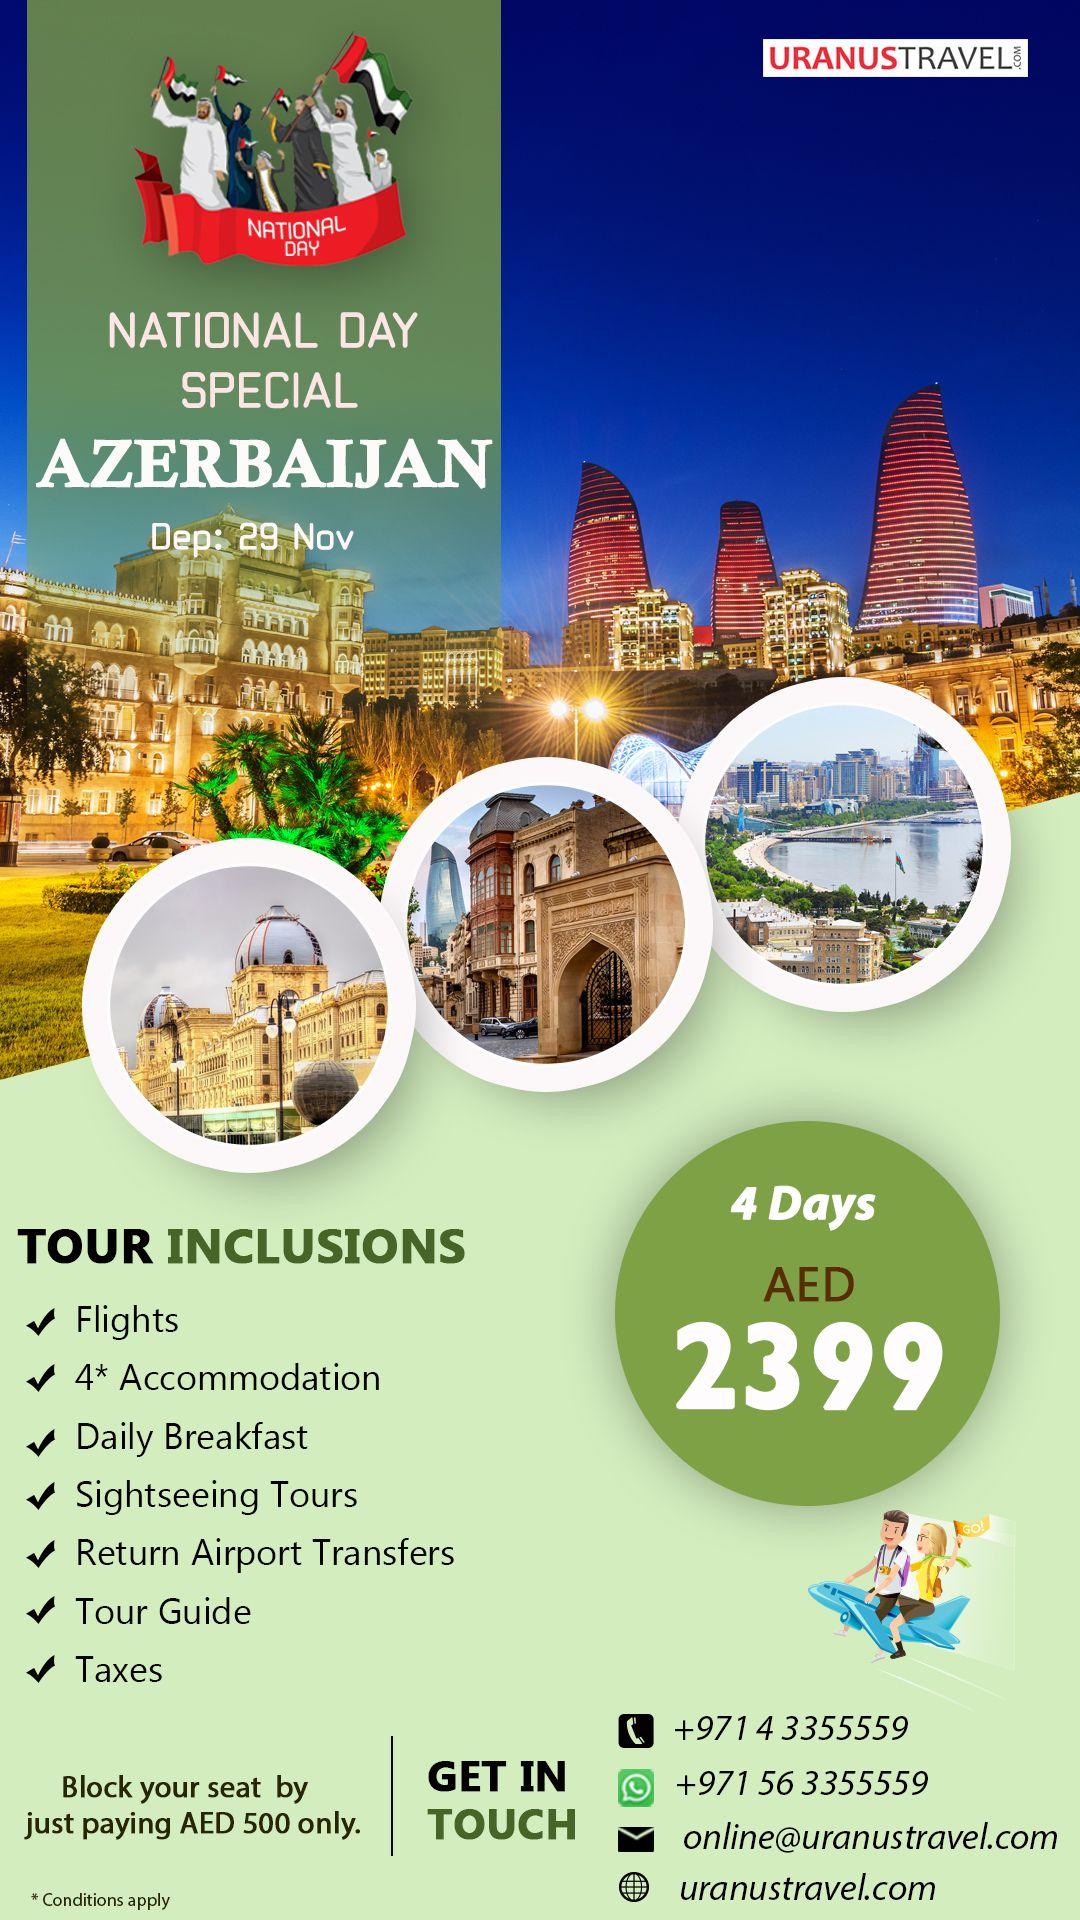 Holiday Package To Baku On This Uae National Day Baku Uaenationaldayholidays Azerbaijan Tourpackage Tour Packages Holiday Packaging Europe Tours